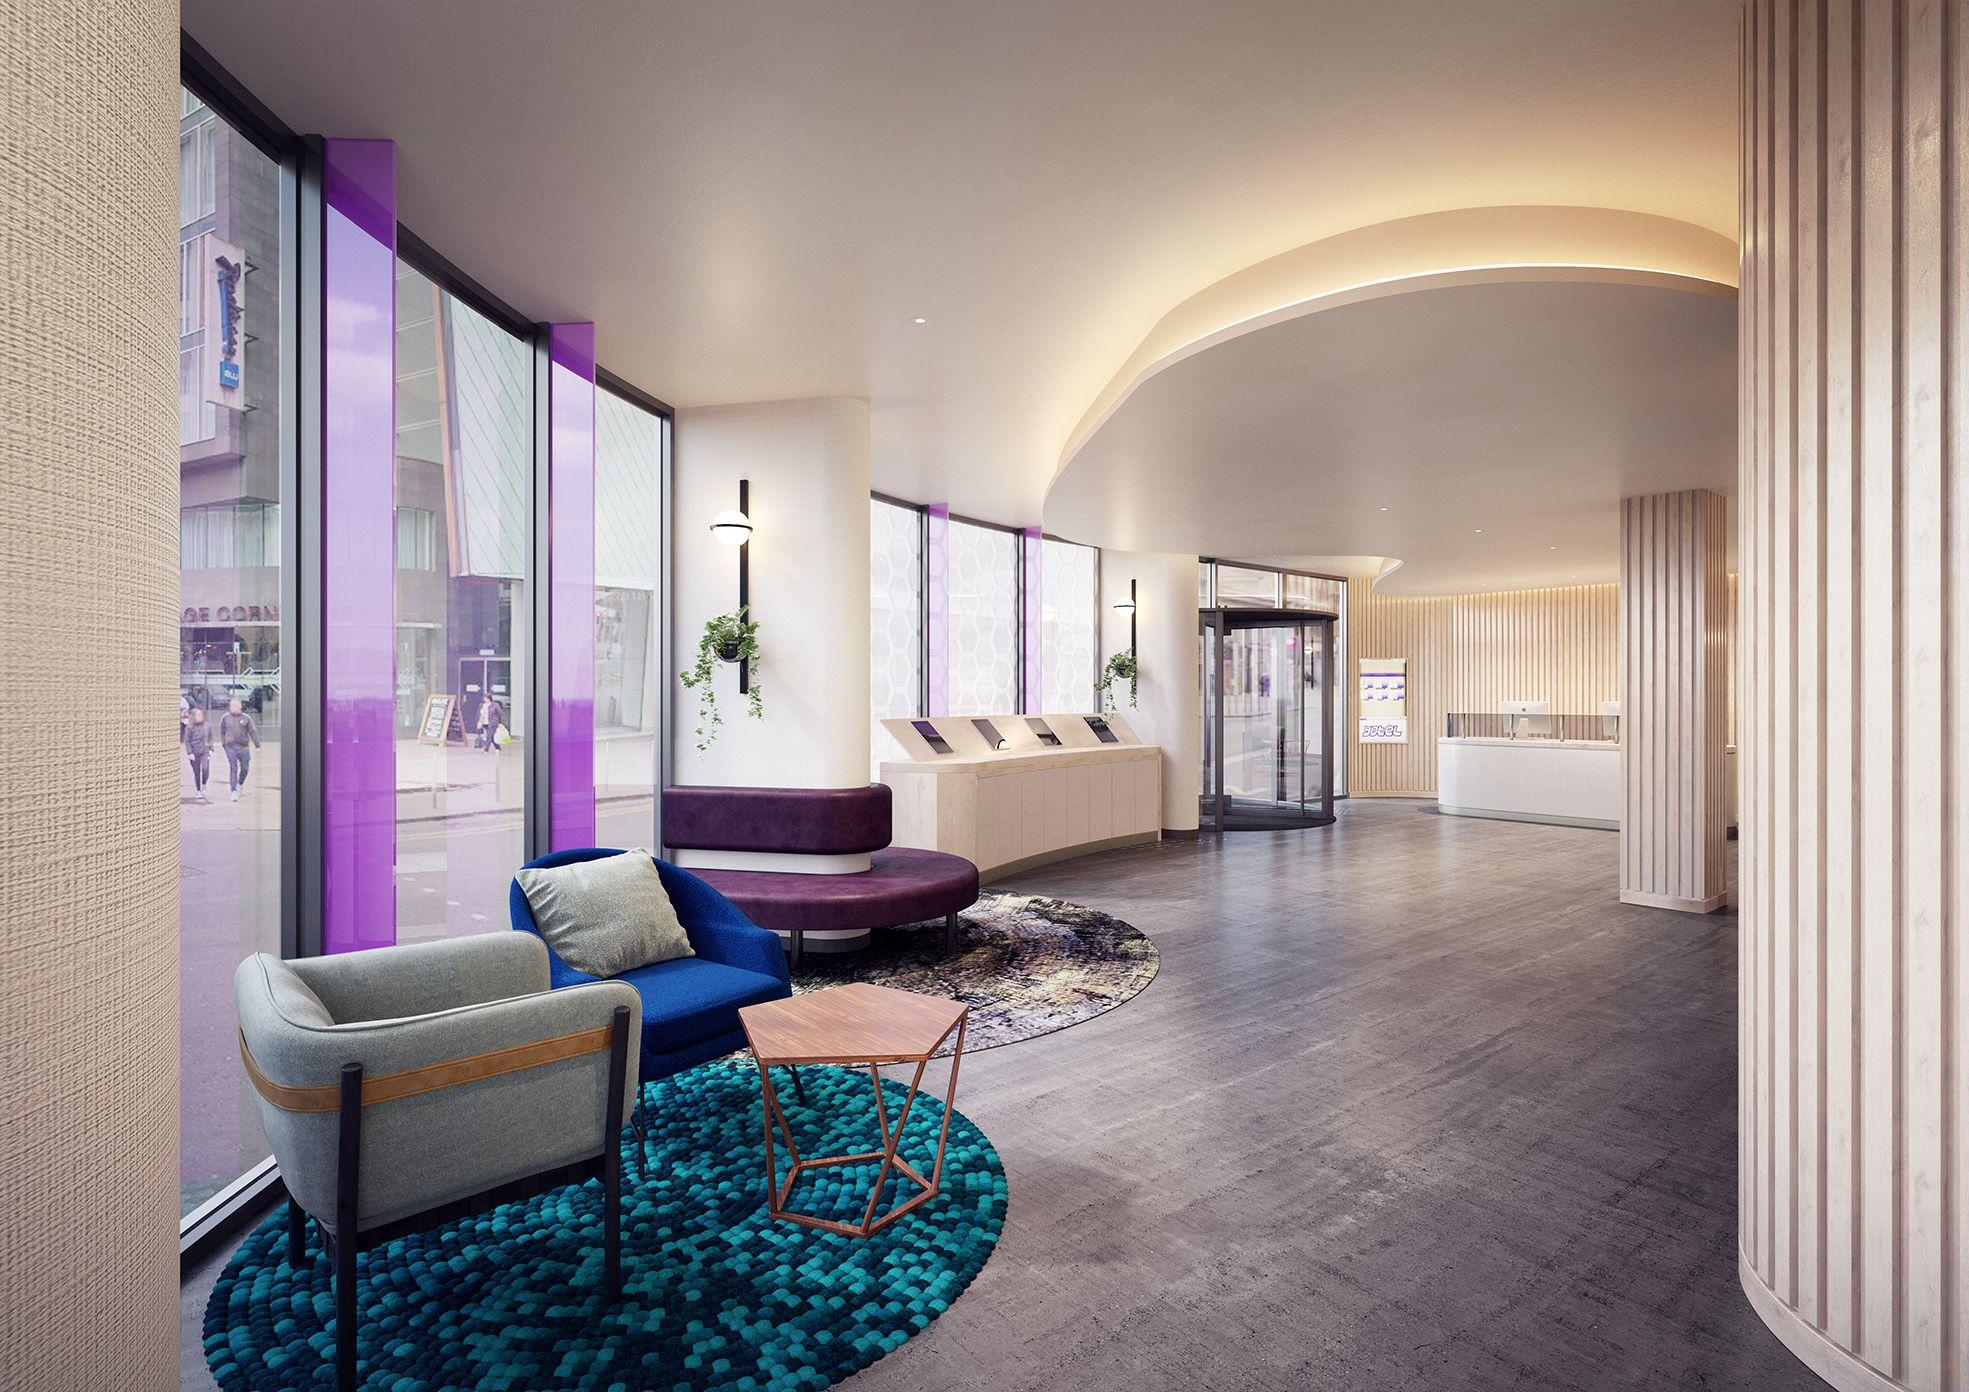 Yotel Glasgow Hotels Room Glasgow Central Station Home